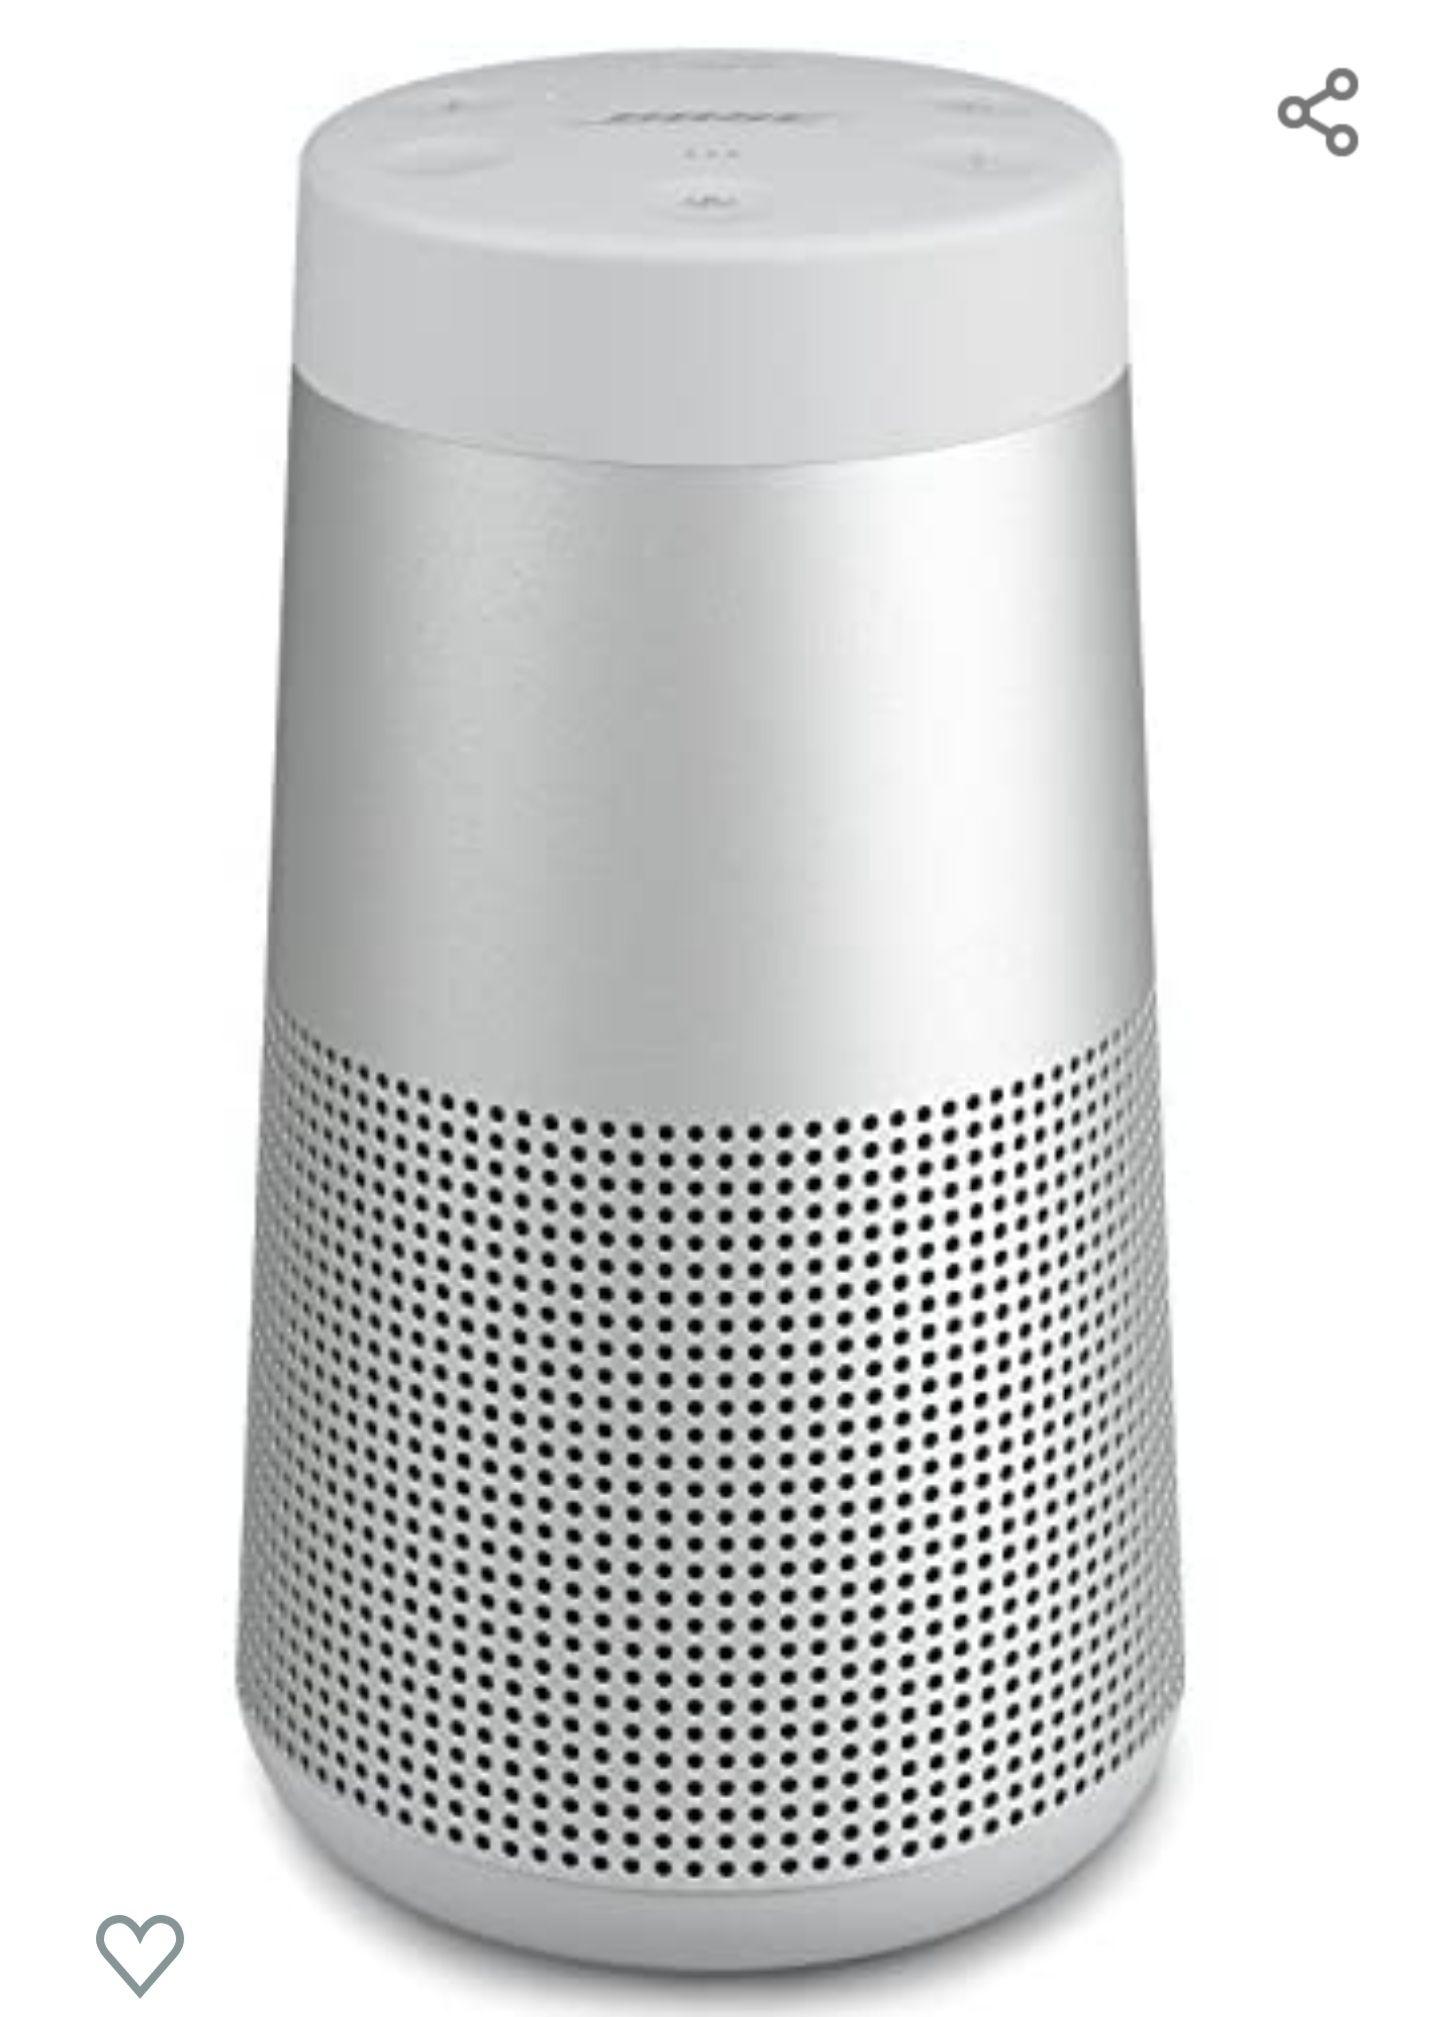 Amazon: Bose SoundLink Revolve Altavoz Bluetooth